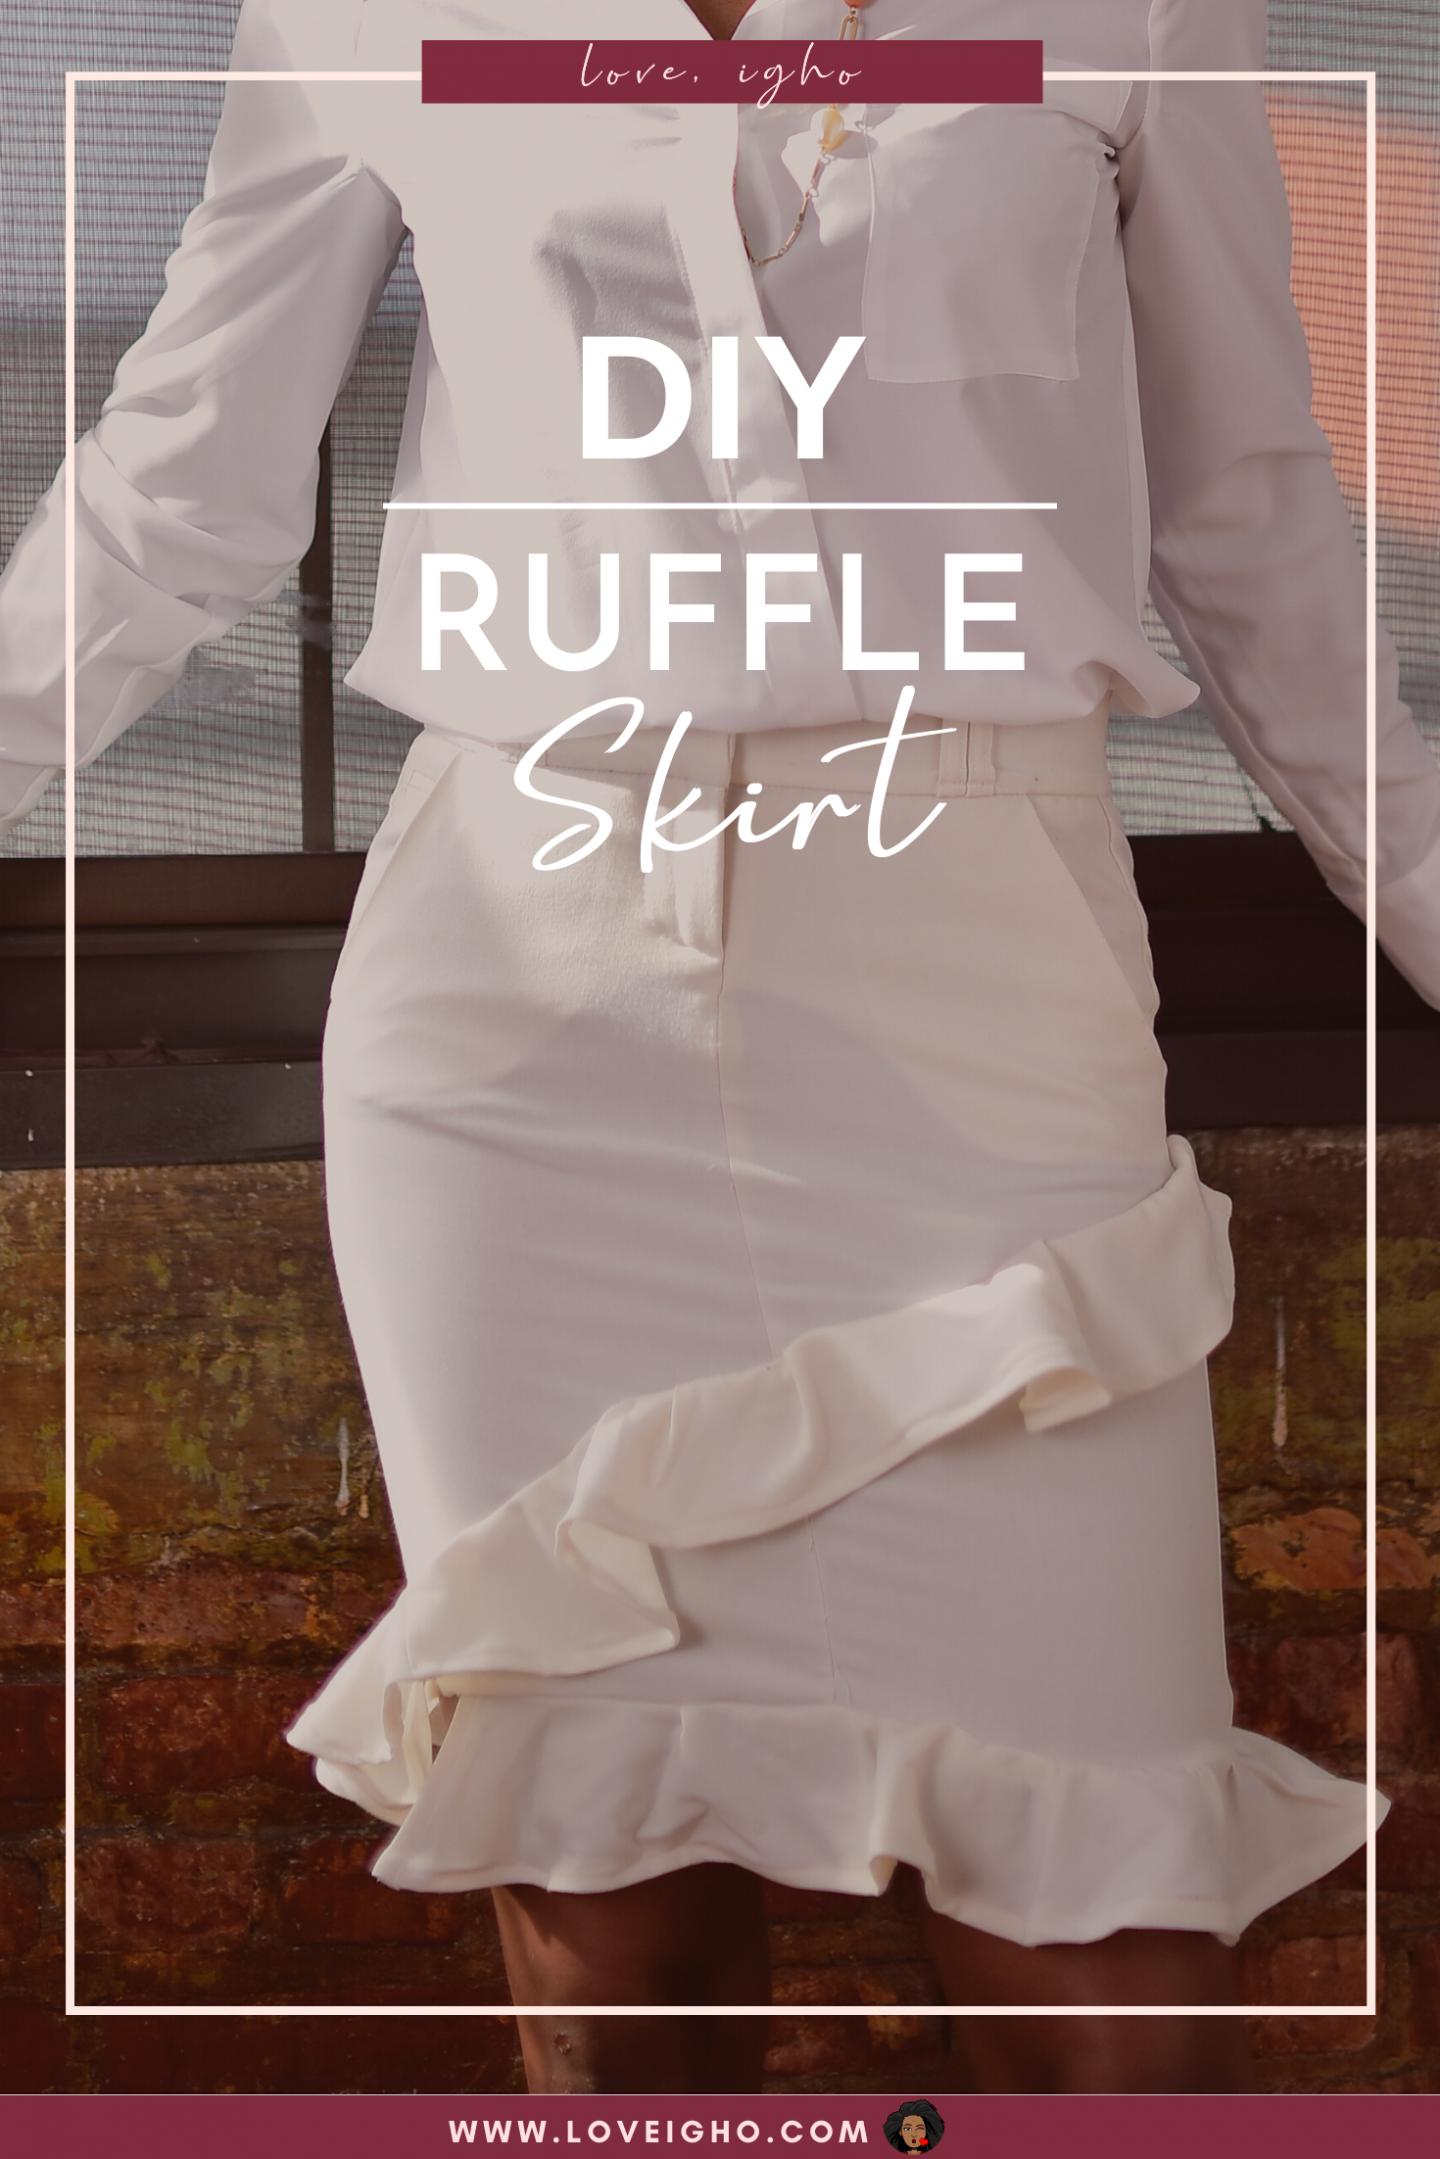 DIY Ruffle Skirt | Love Igho